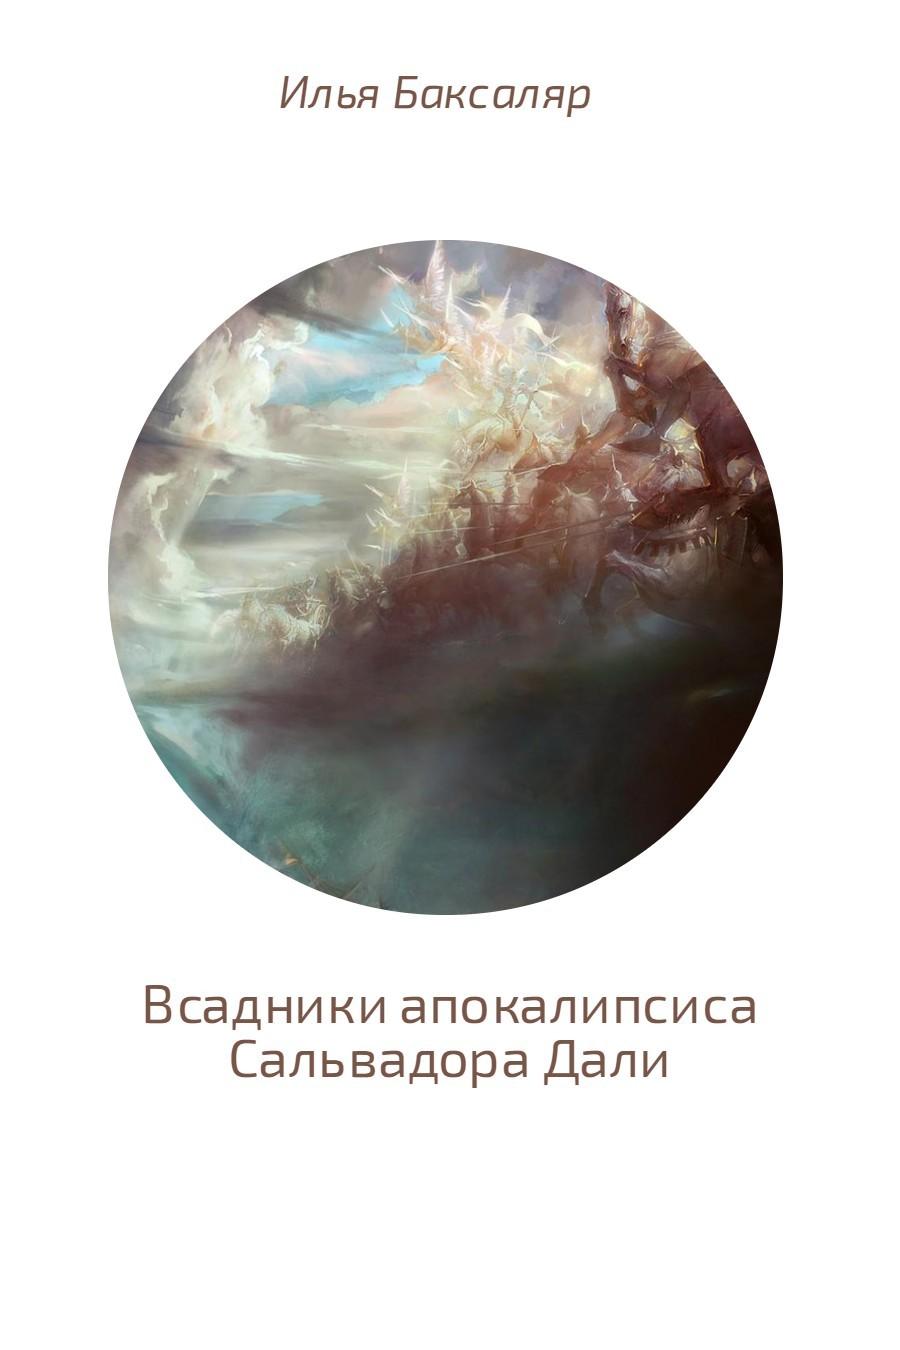 Илья Баксаляр - Всадники апокалипсиса Сальвадора Дали